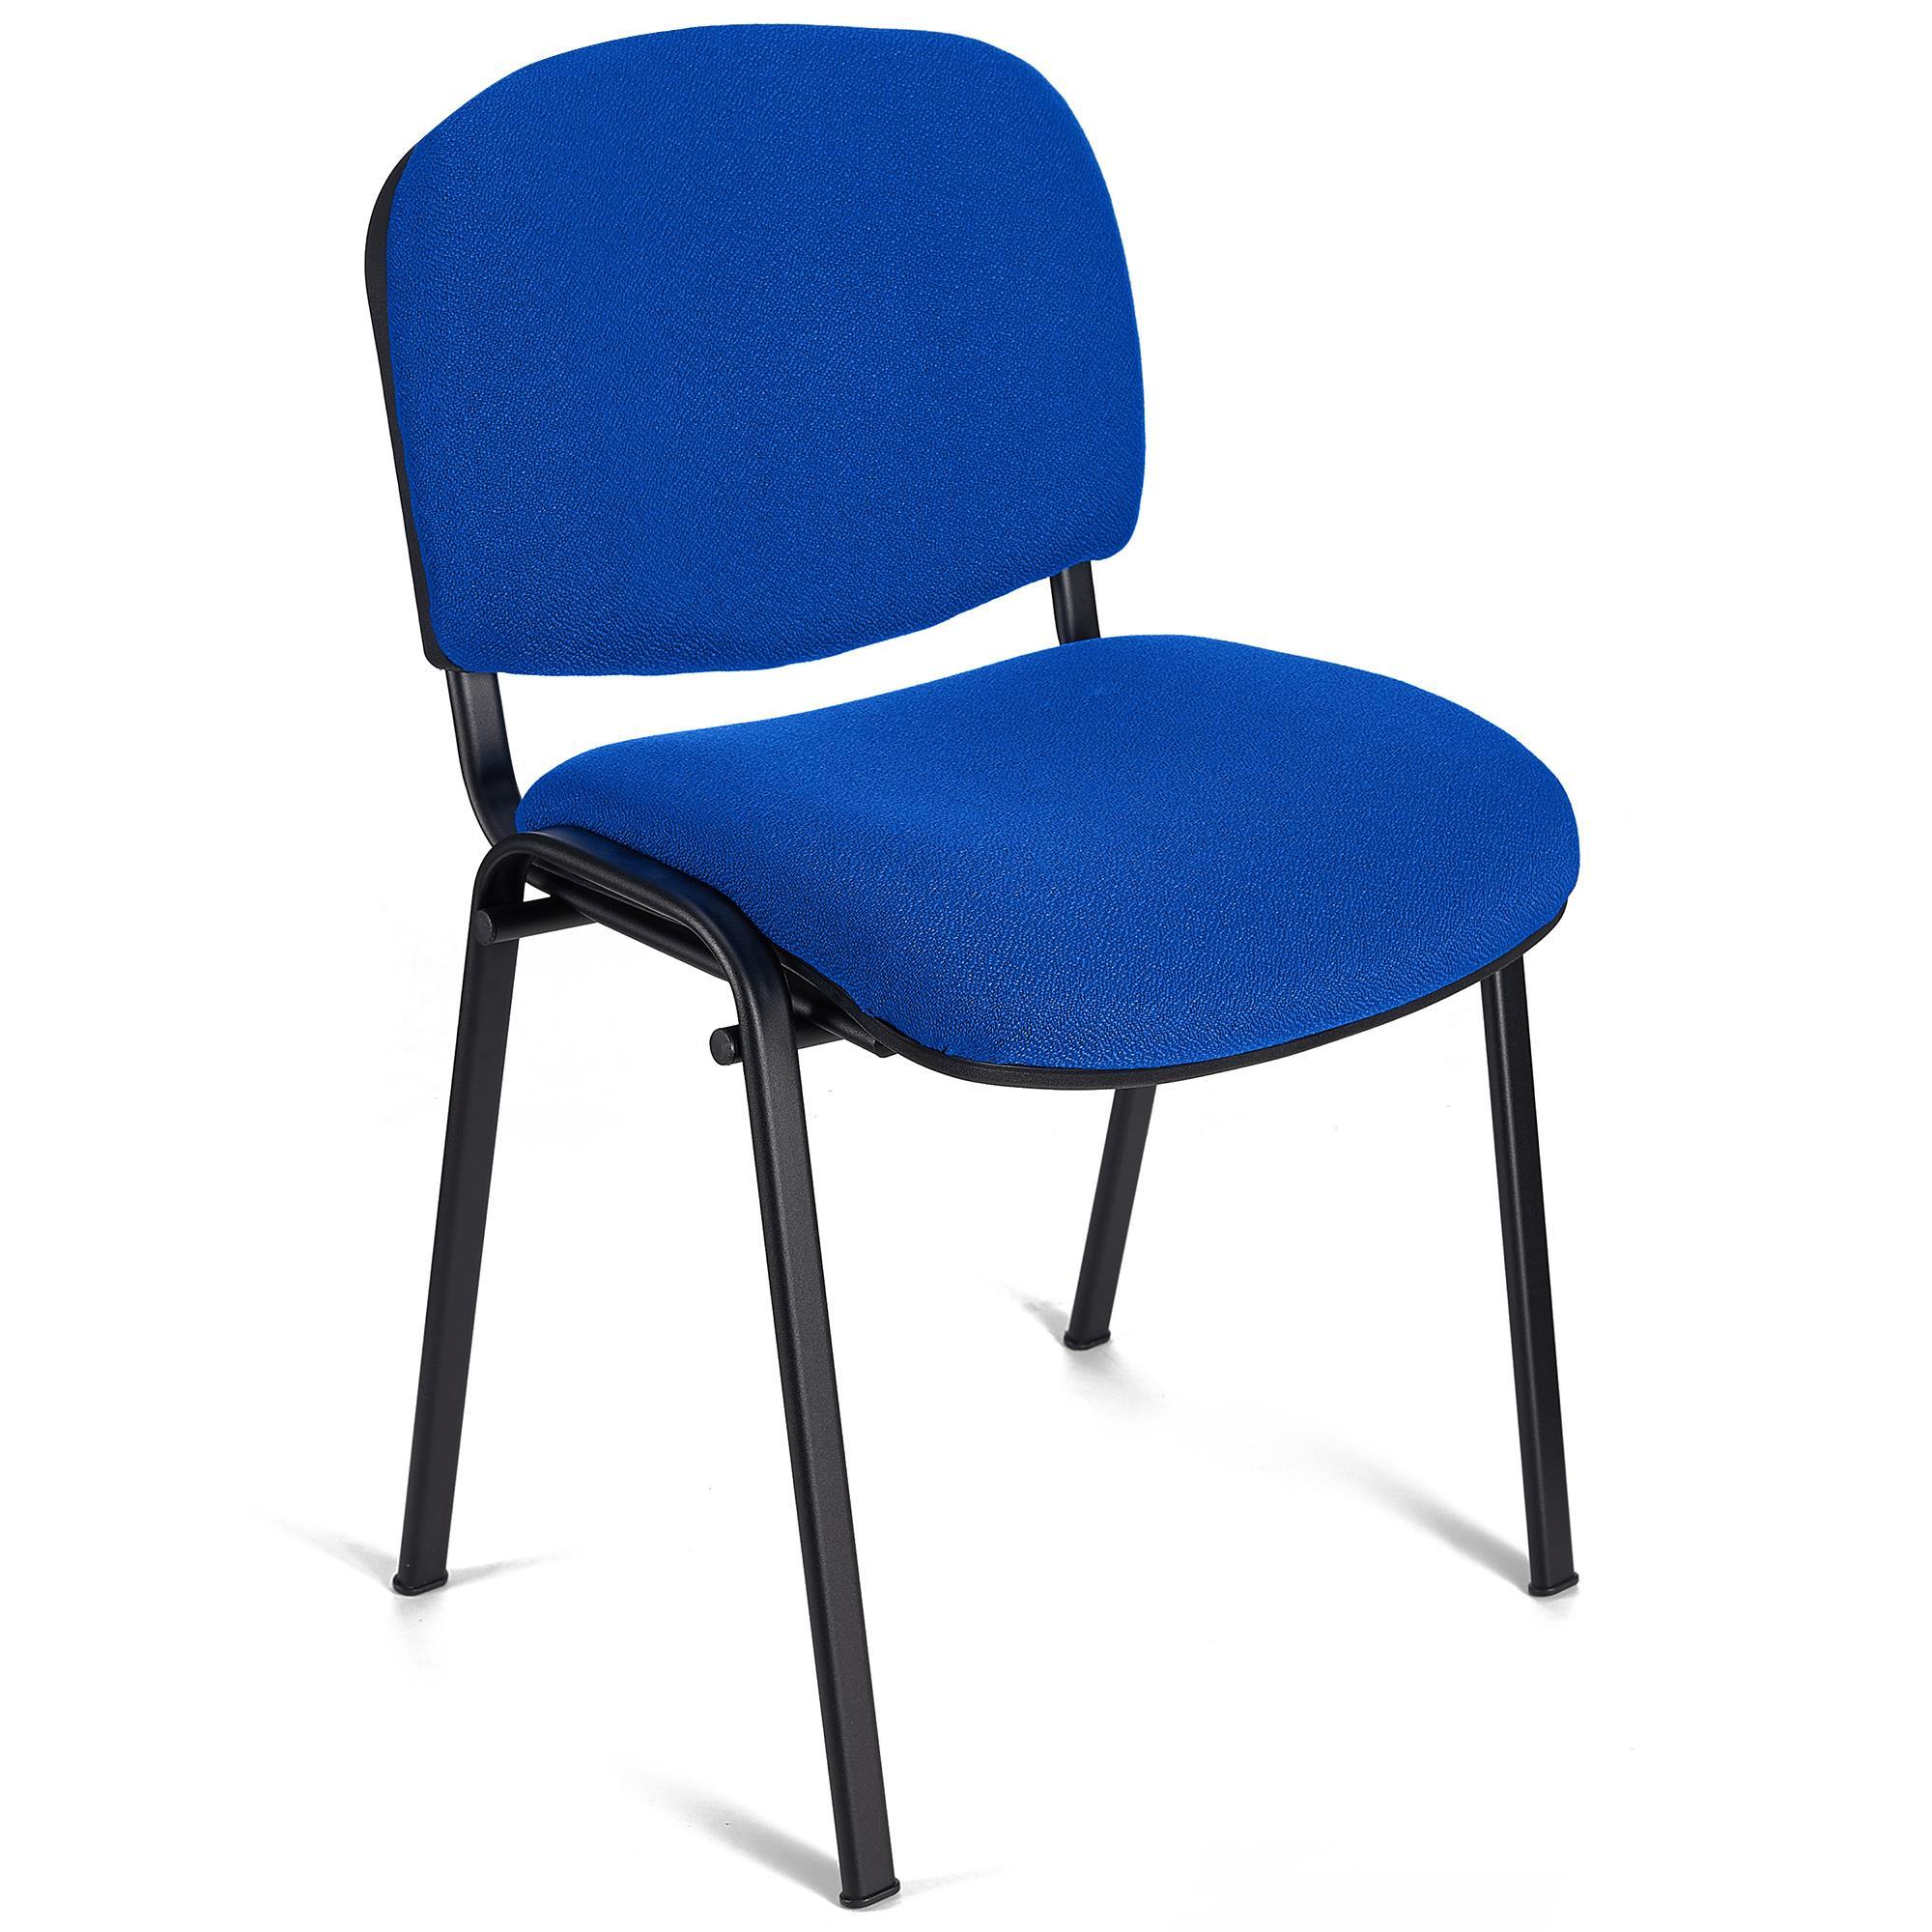 Lote 5 sillas de confidente moby base color azul for Silla de escritorio precio